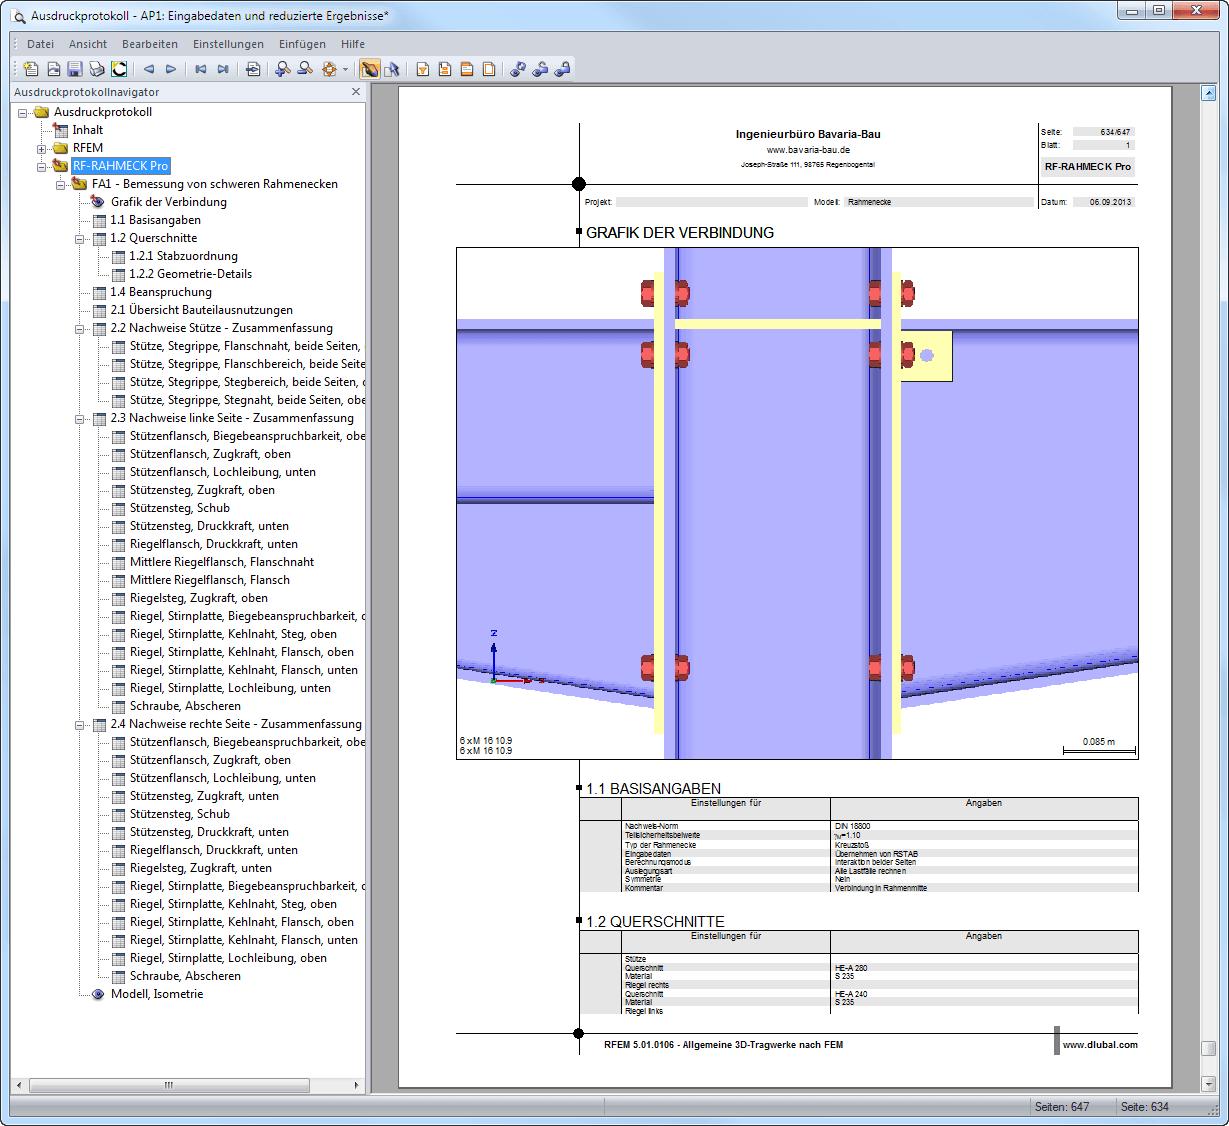 Rahmeck pro eckverbindungen f r rahmen nach ec 3 dlubal for Rahmen berechnen statik